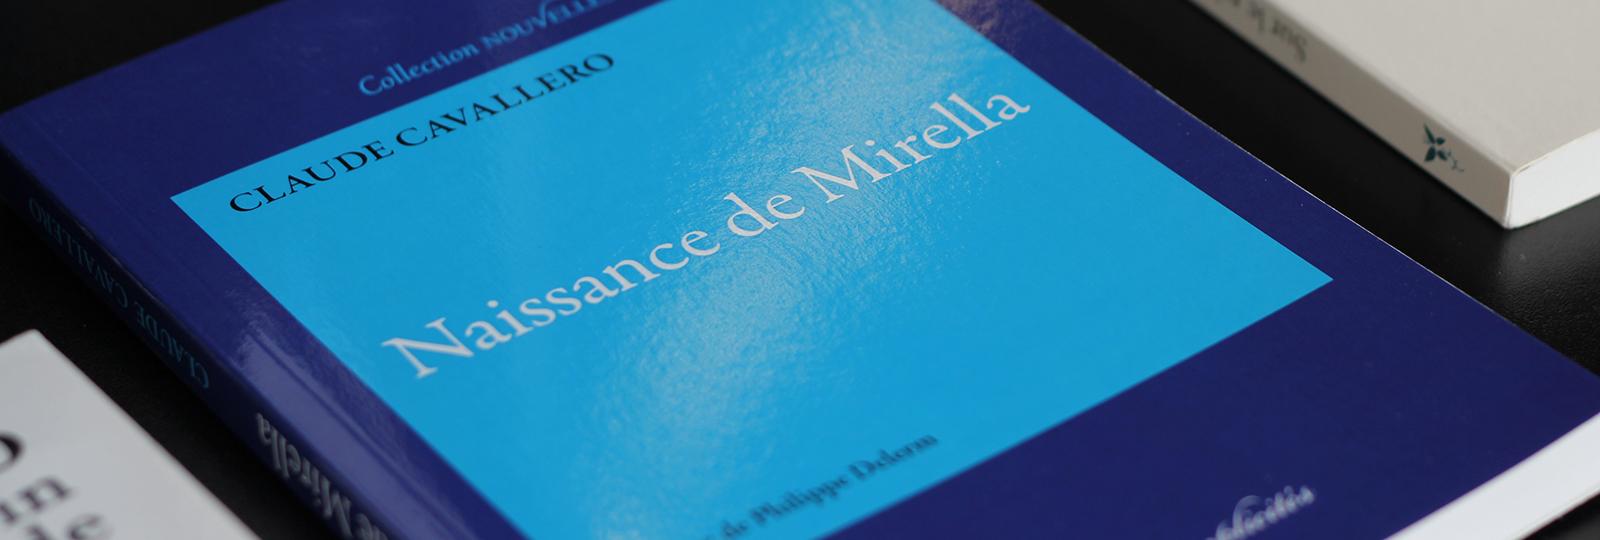 Naissance de Mirella - Claude Cavallero